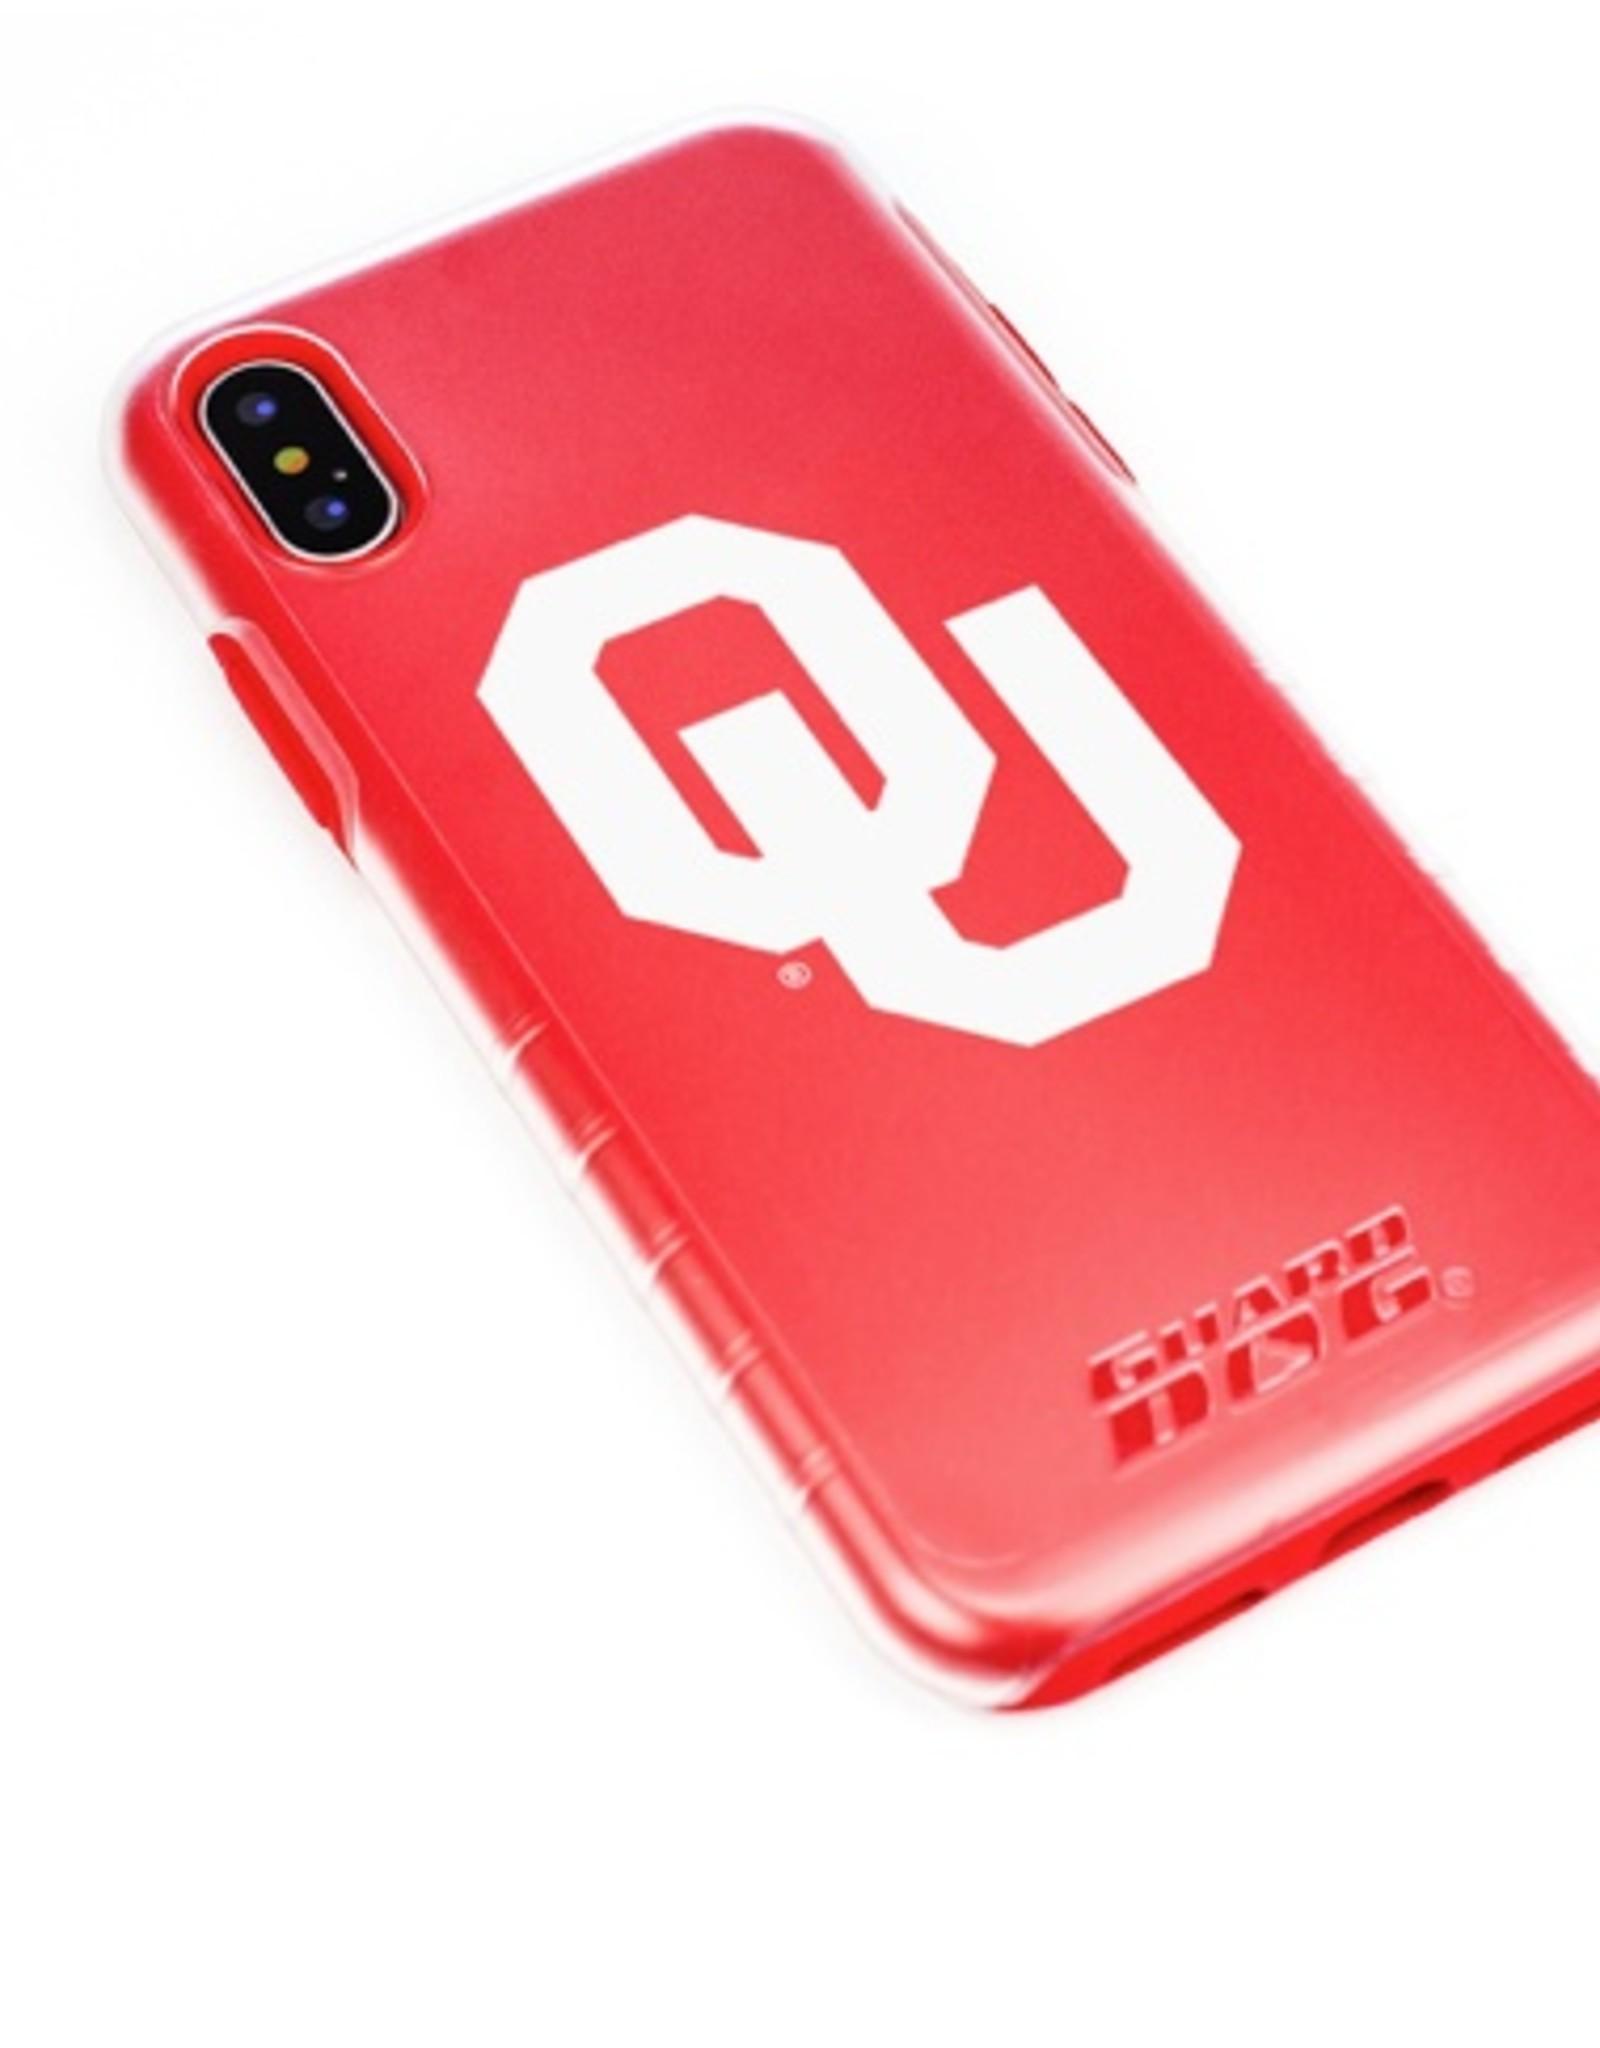 Guard Dog OU Guard Dog Clear/Crimson Hybrid Case w/ Guard Glass Screen Protector iPhone X/XS